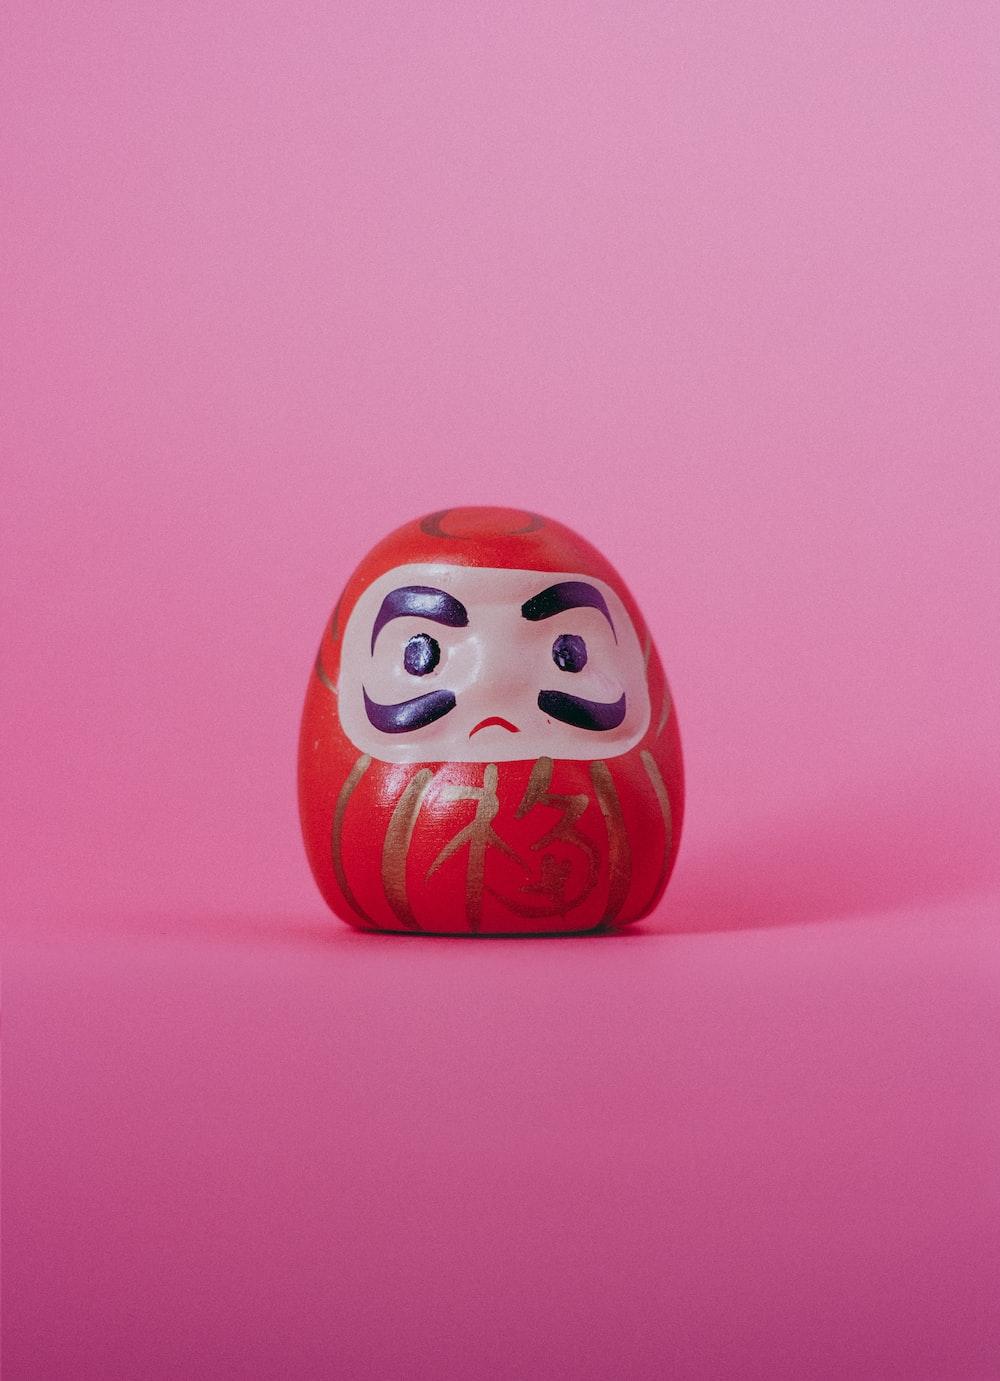 red and white Daruma doll figurine